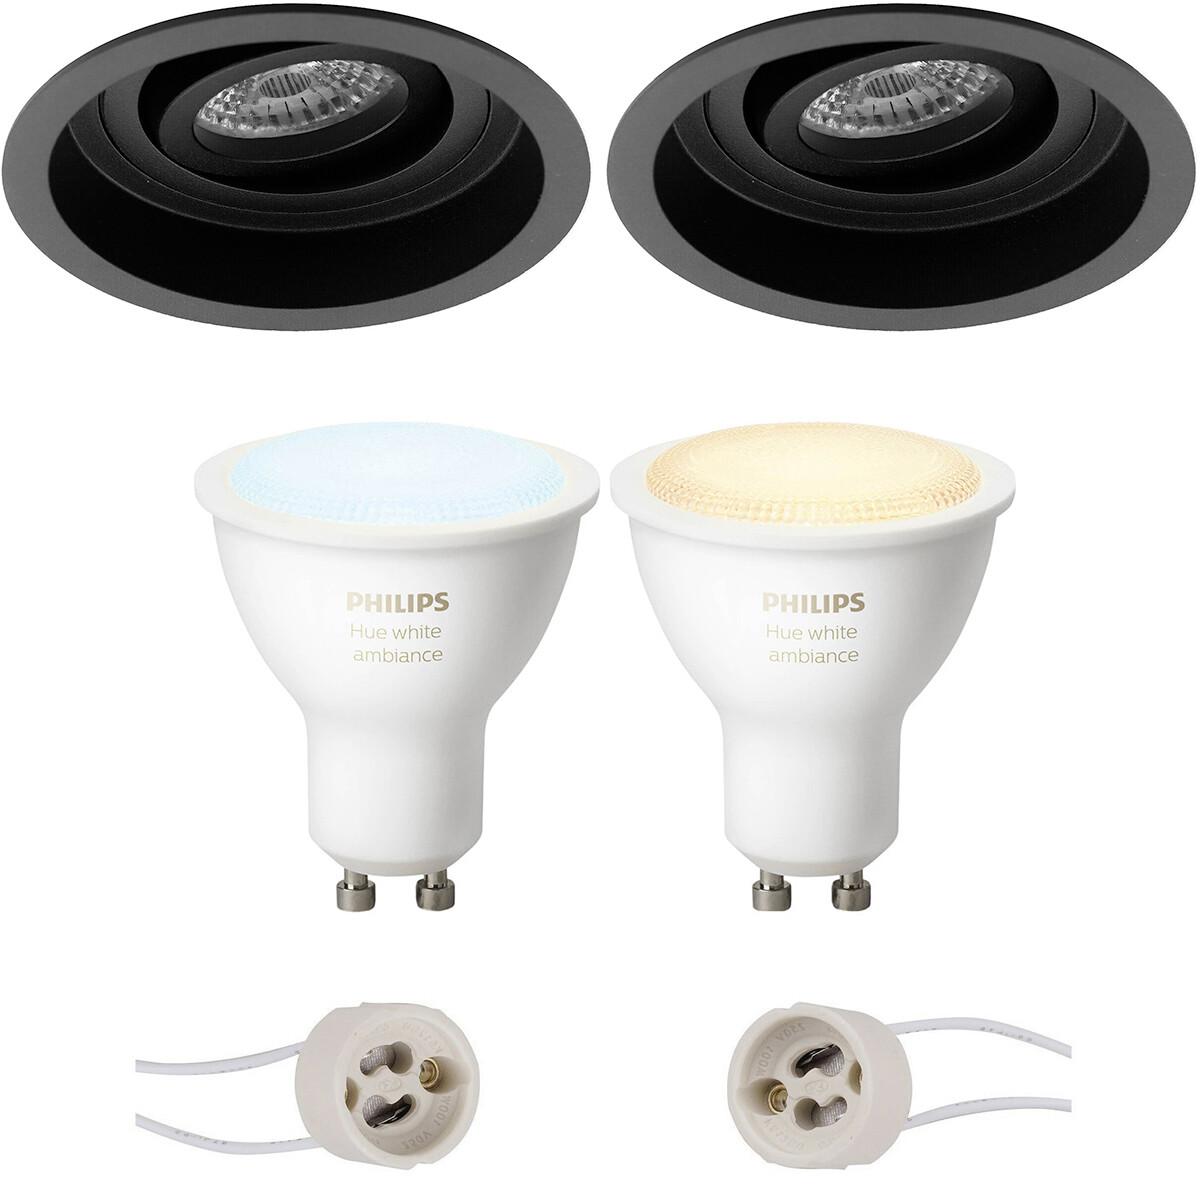 Pragmi Domy Pro - Inbouw Rond - Mat Zwart - Verdiept - Kantelbaar - Ø105mm - Philips Hue - LED Spot